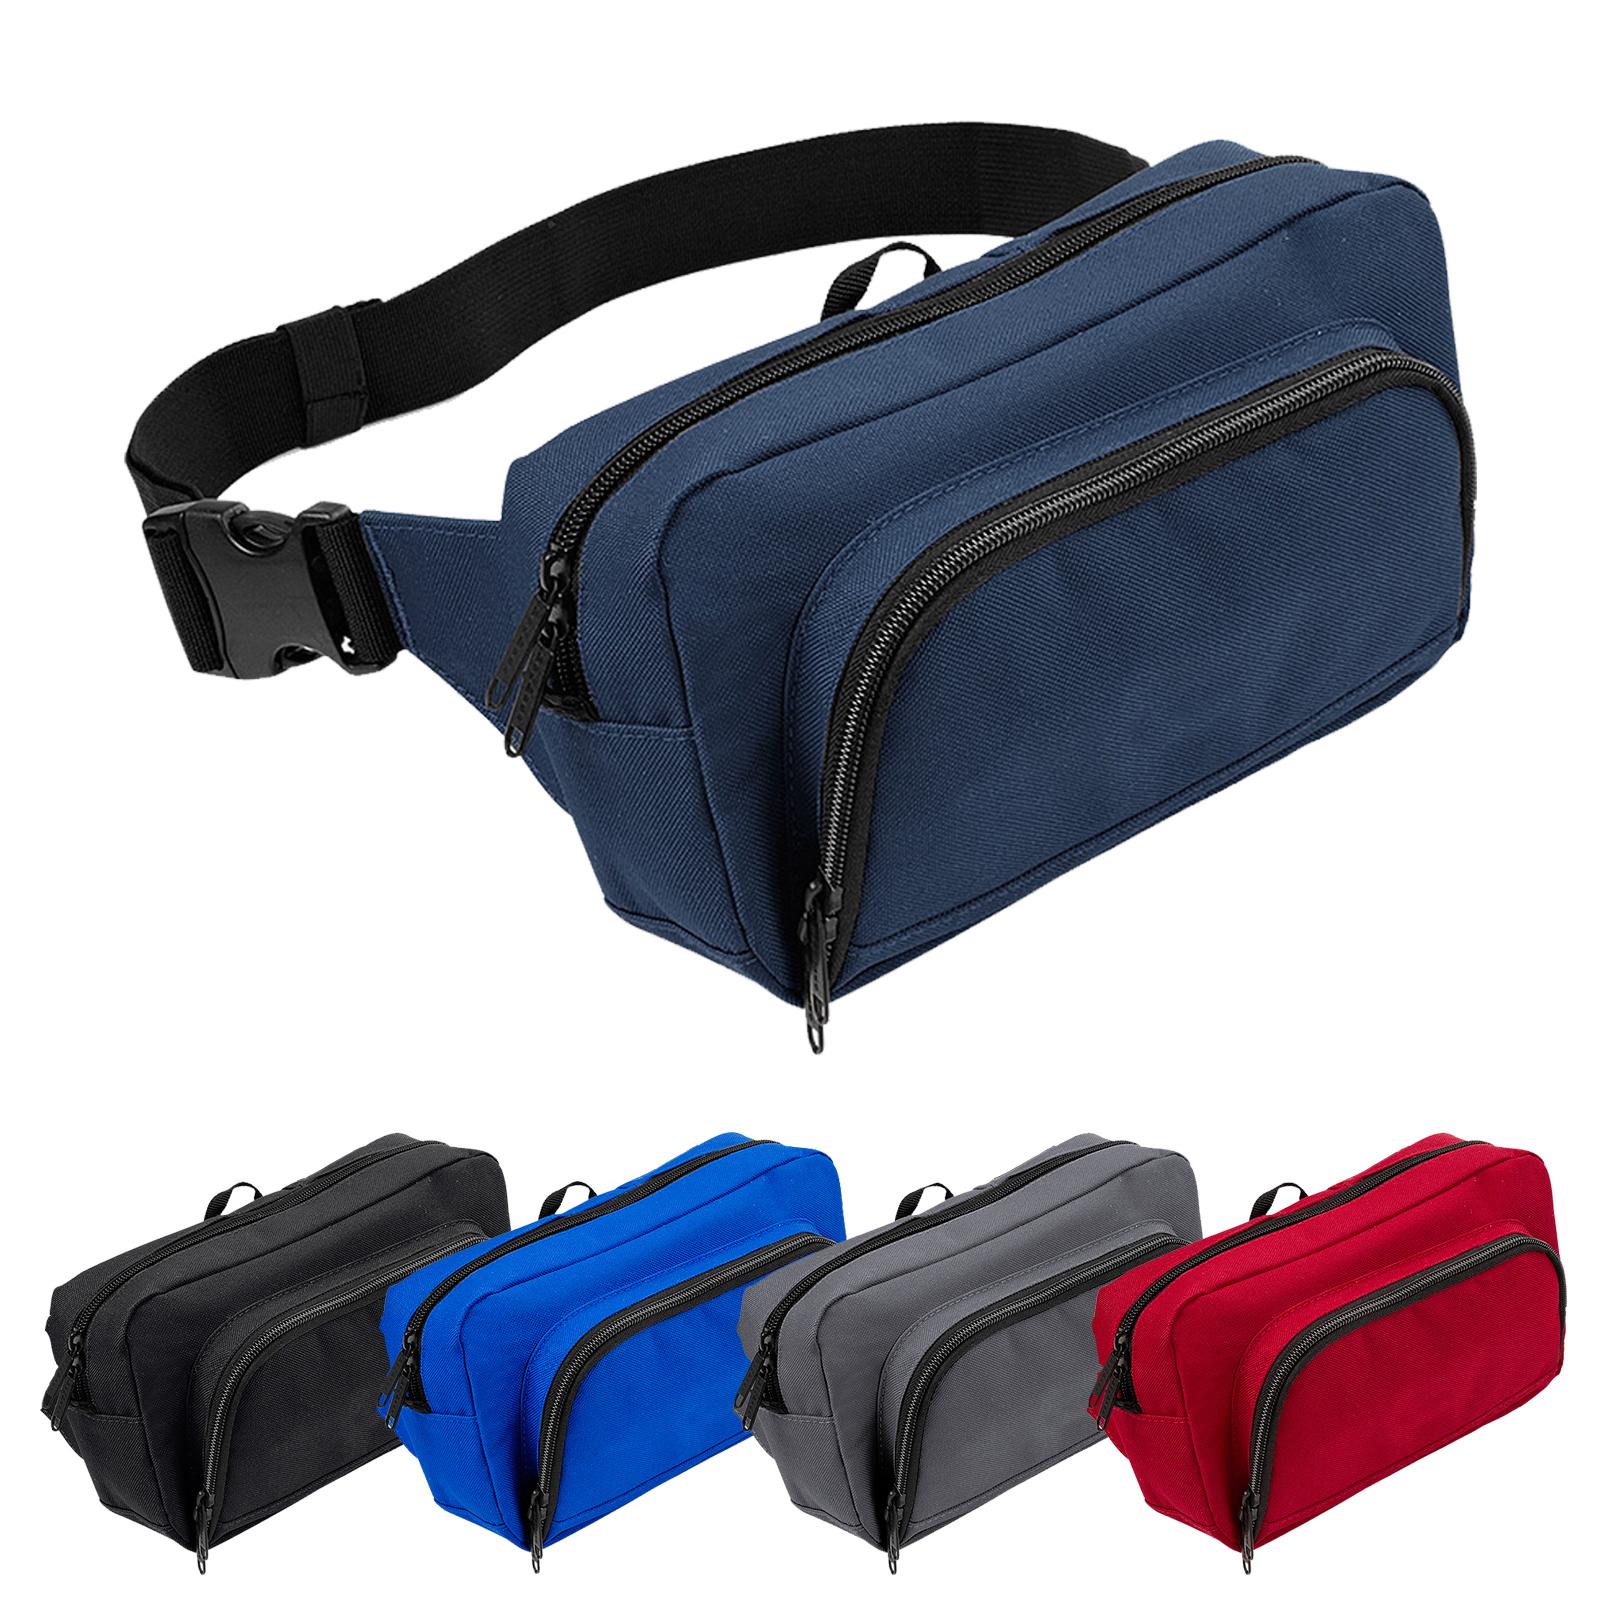 Waist Money Belt Bag Pack Travel Festival Running Sport Pouch